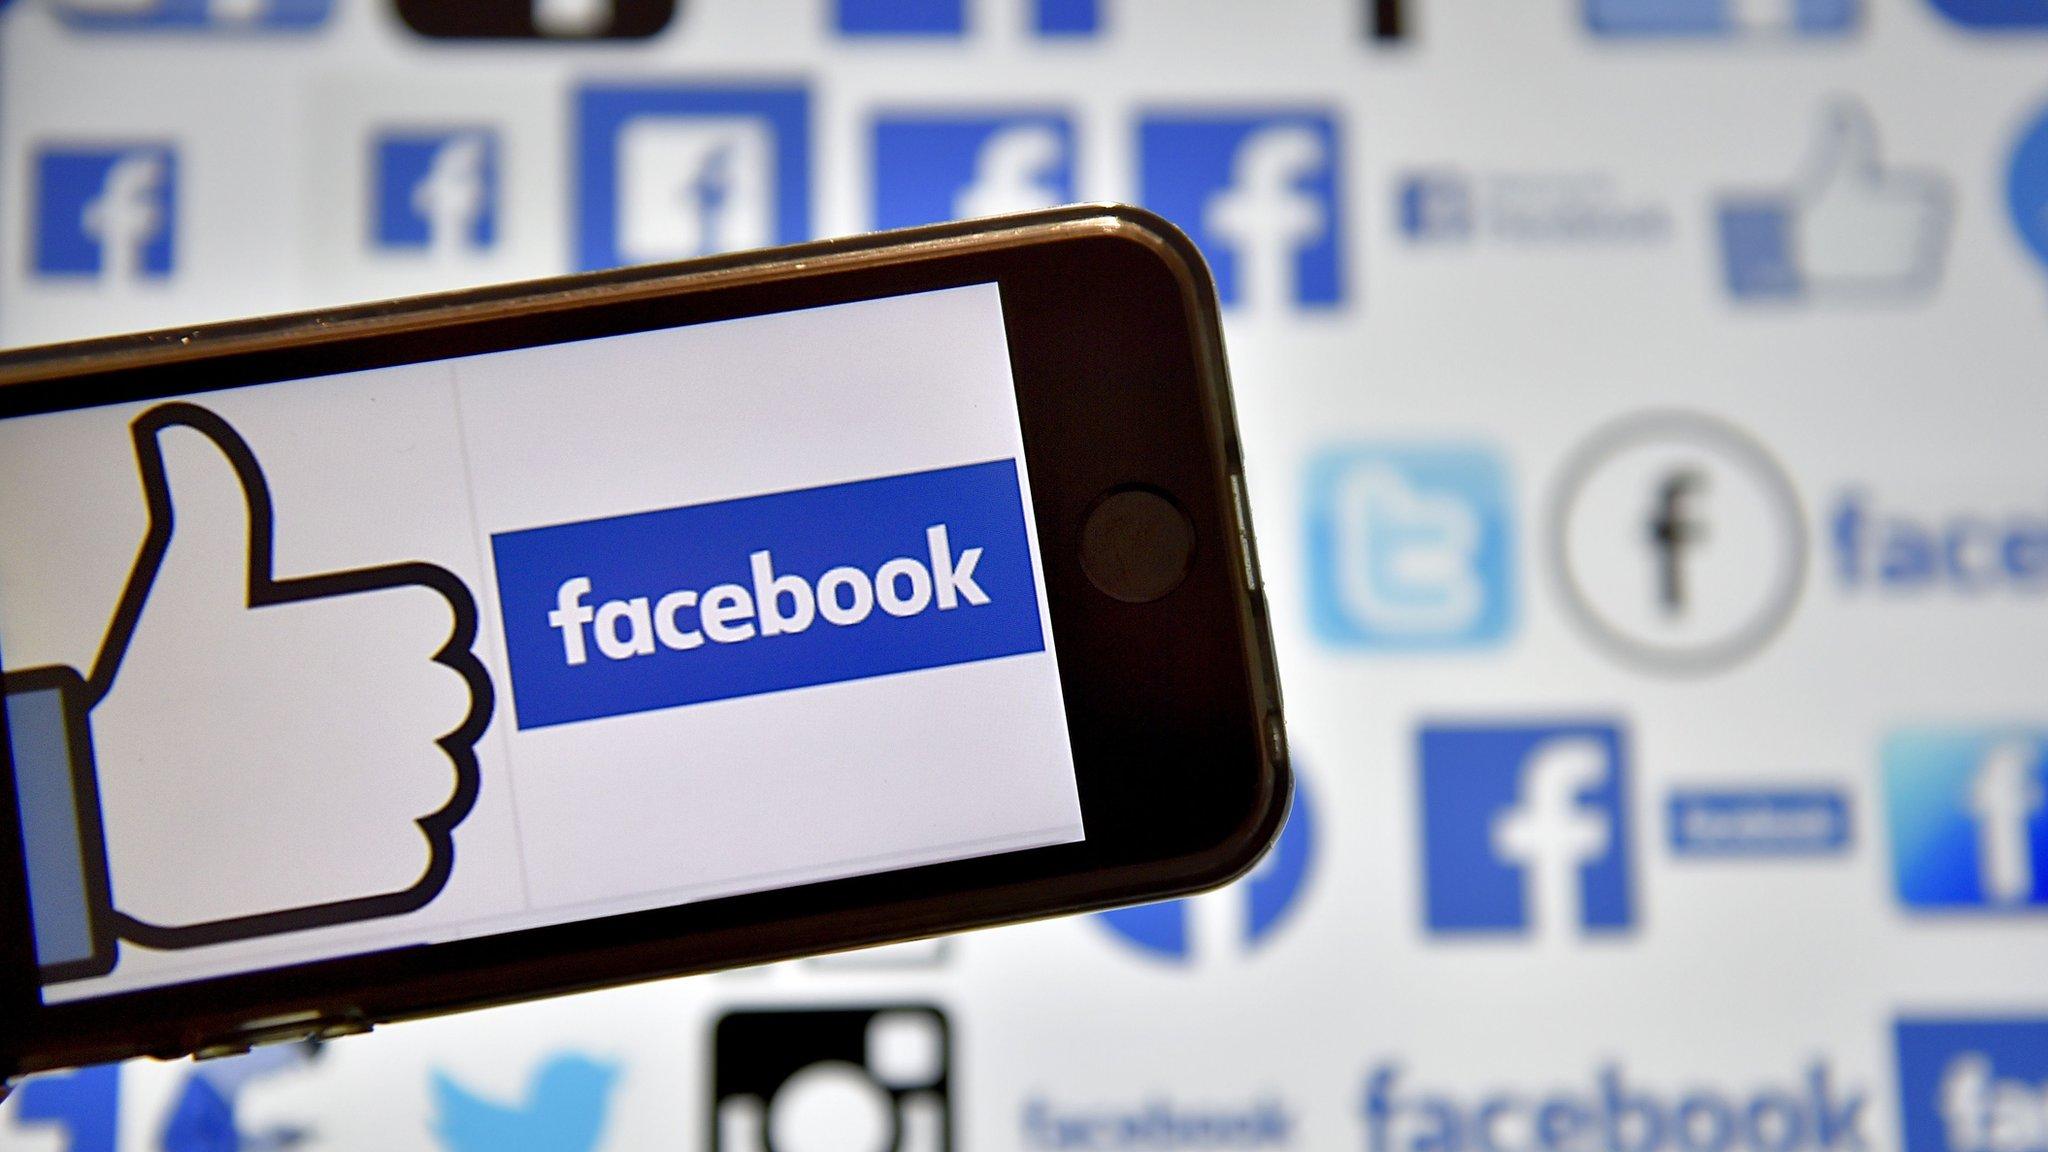 Facebook flush with advertising money